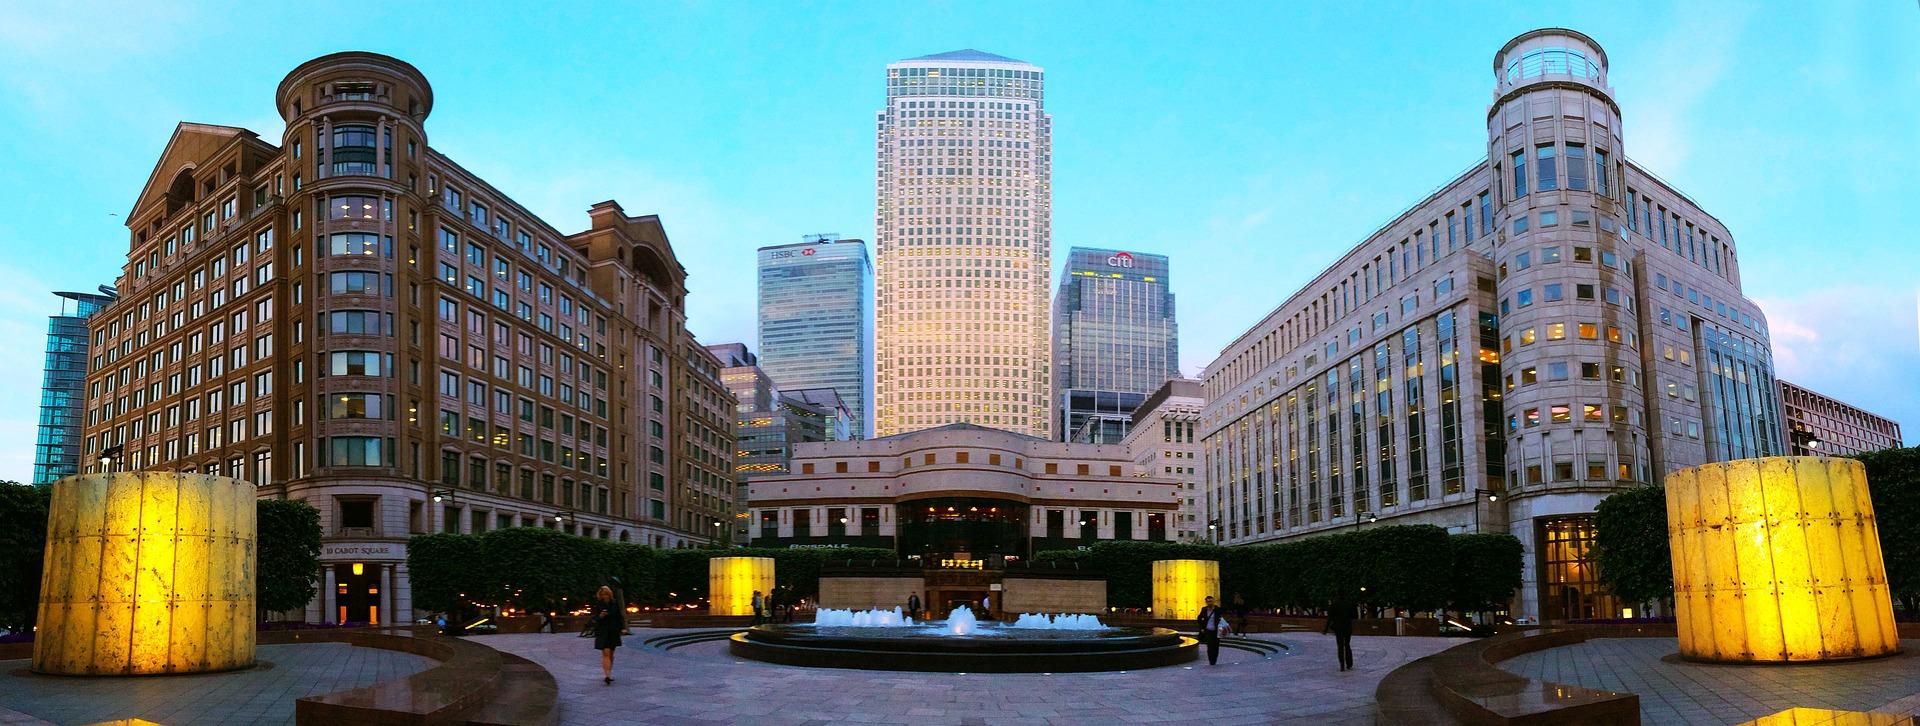 Contact Us Business Bank UK